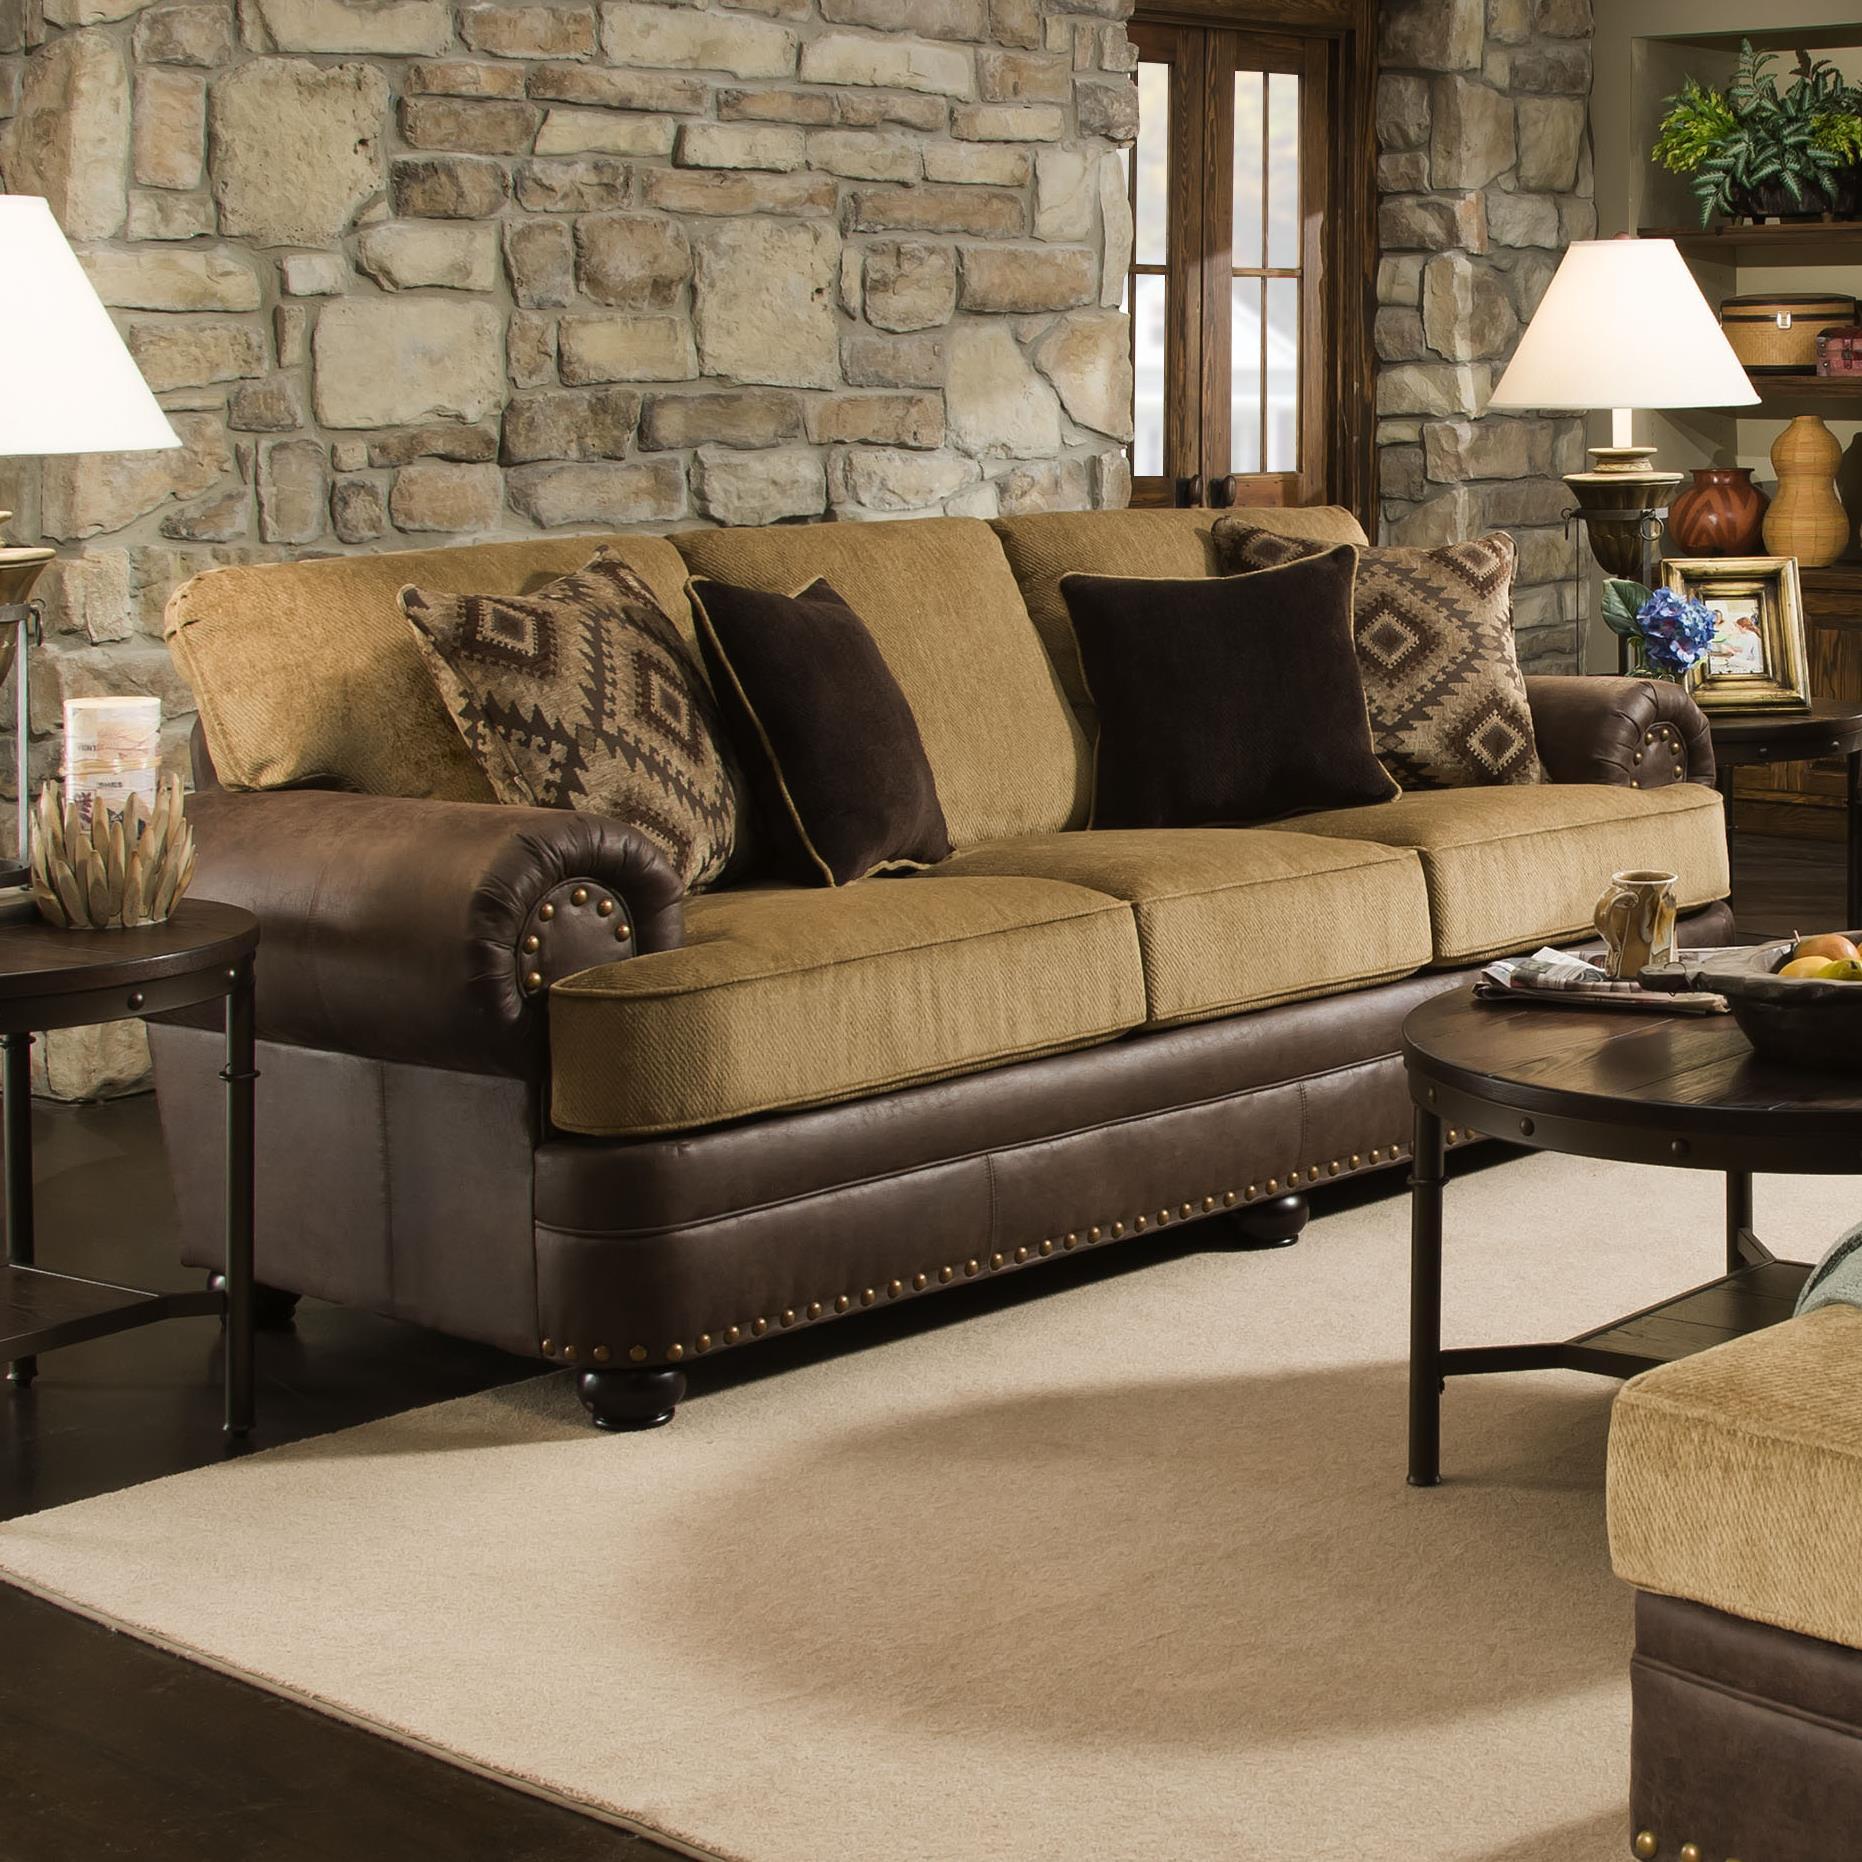 United Furniture Industries 7541 Sofa - Item Number: 7541Sofa-SunflowerTan